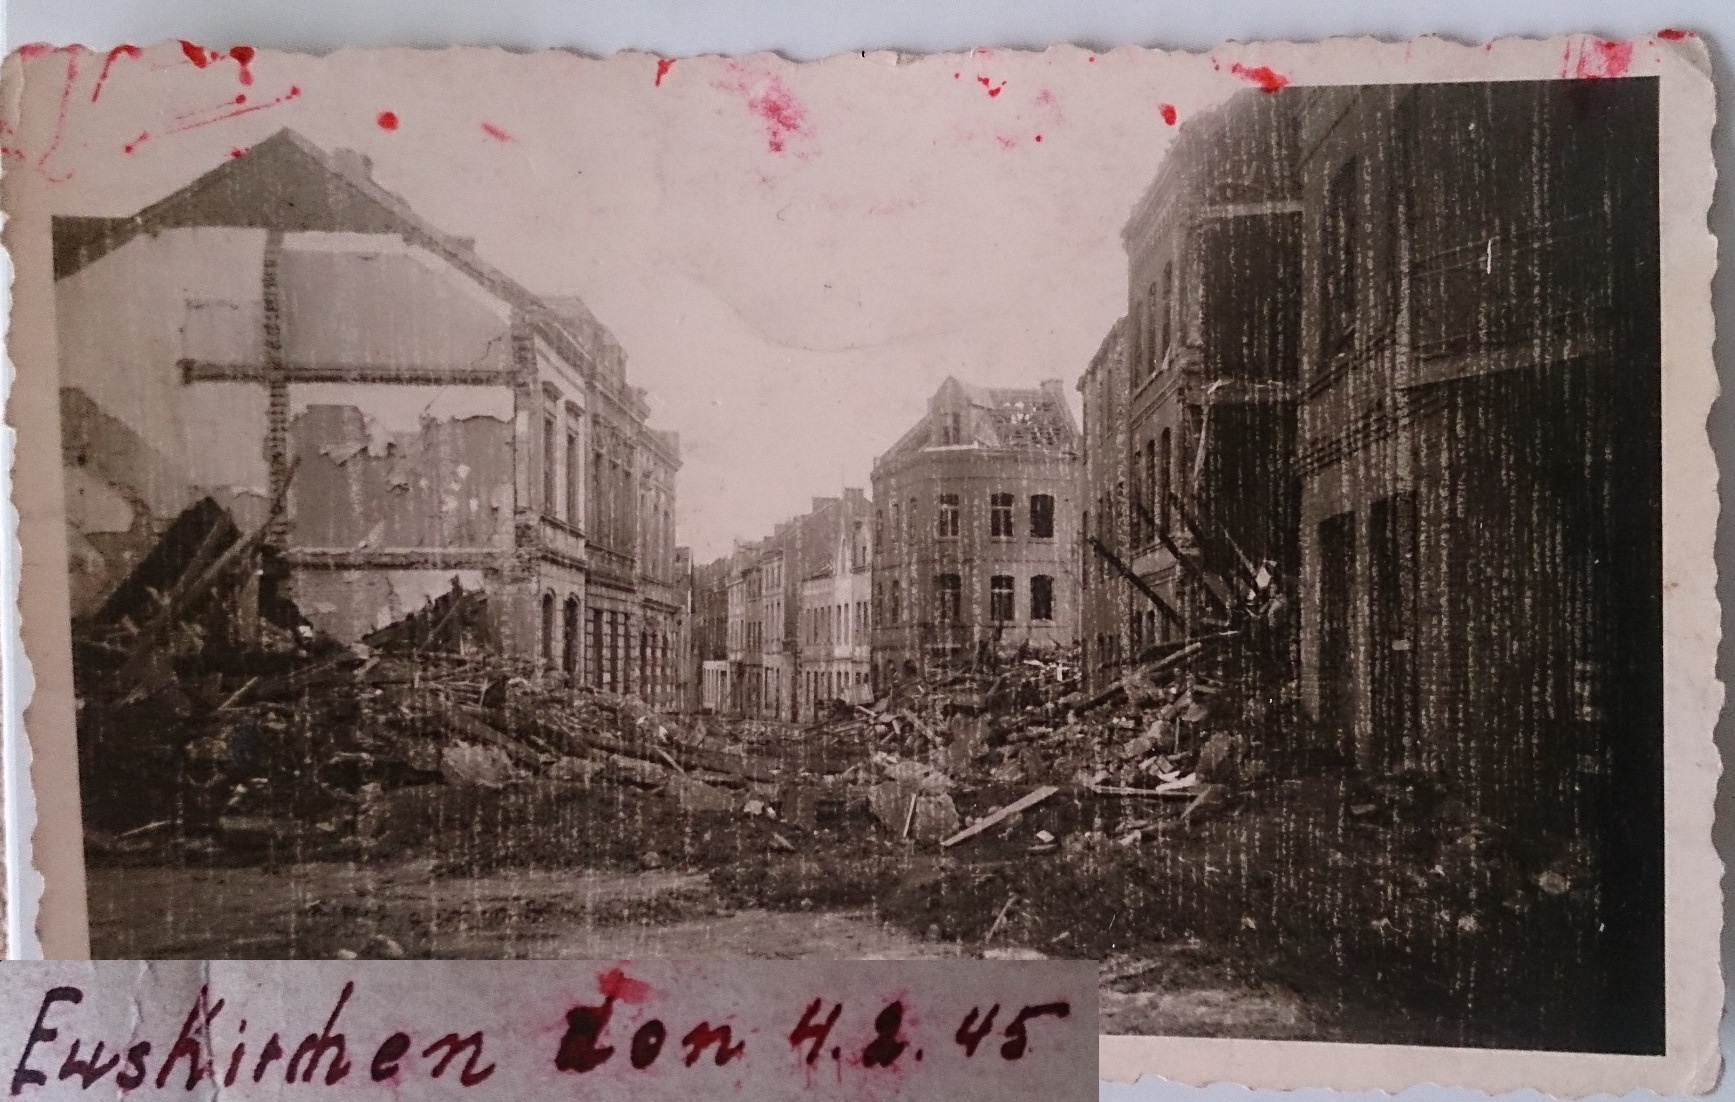 Euskirchen - Innenstadt - 04.02.1945